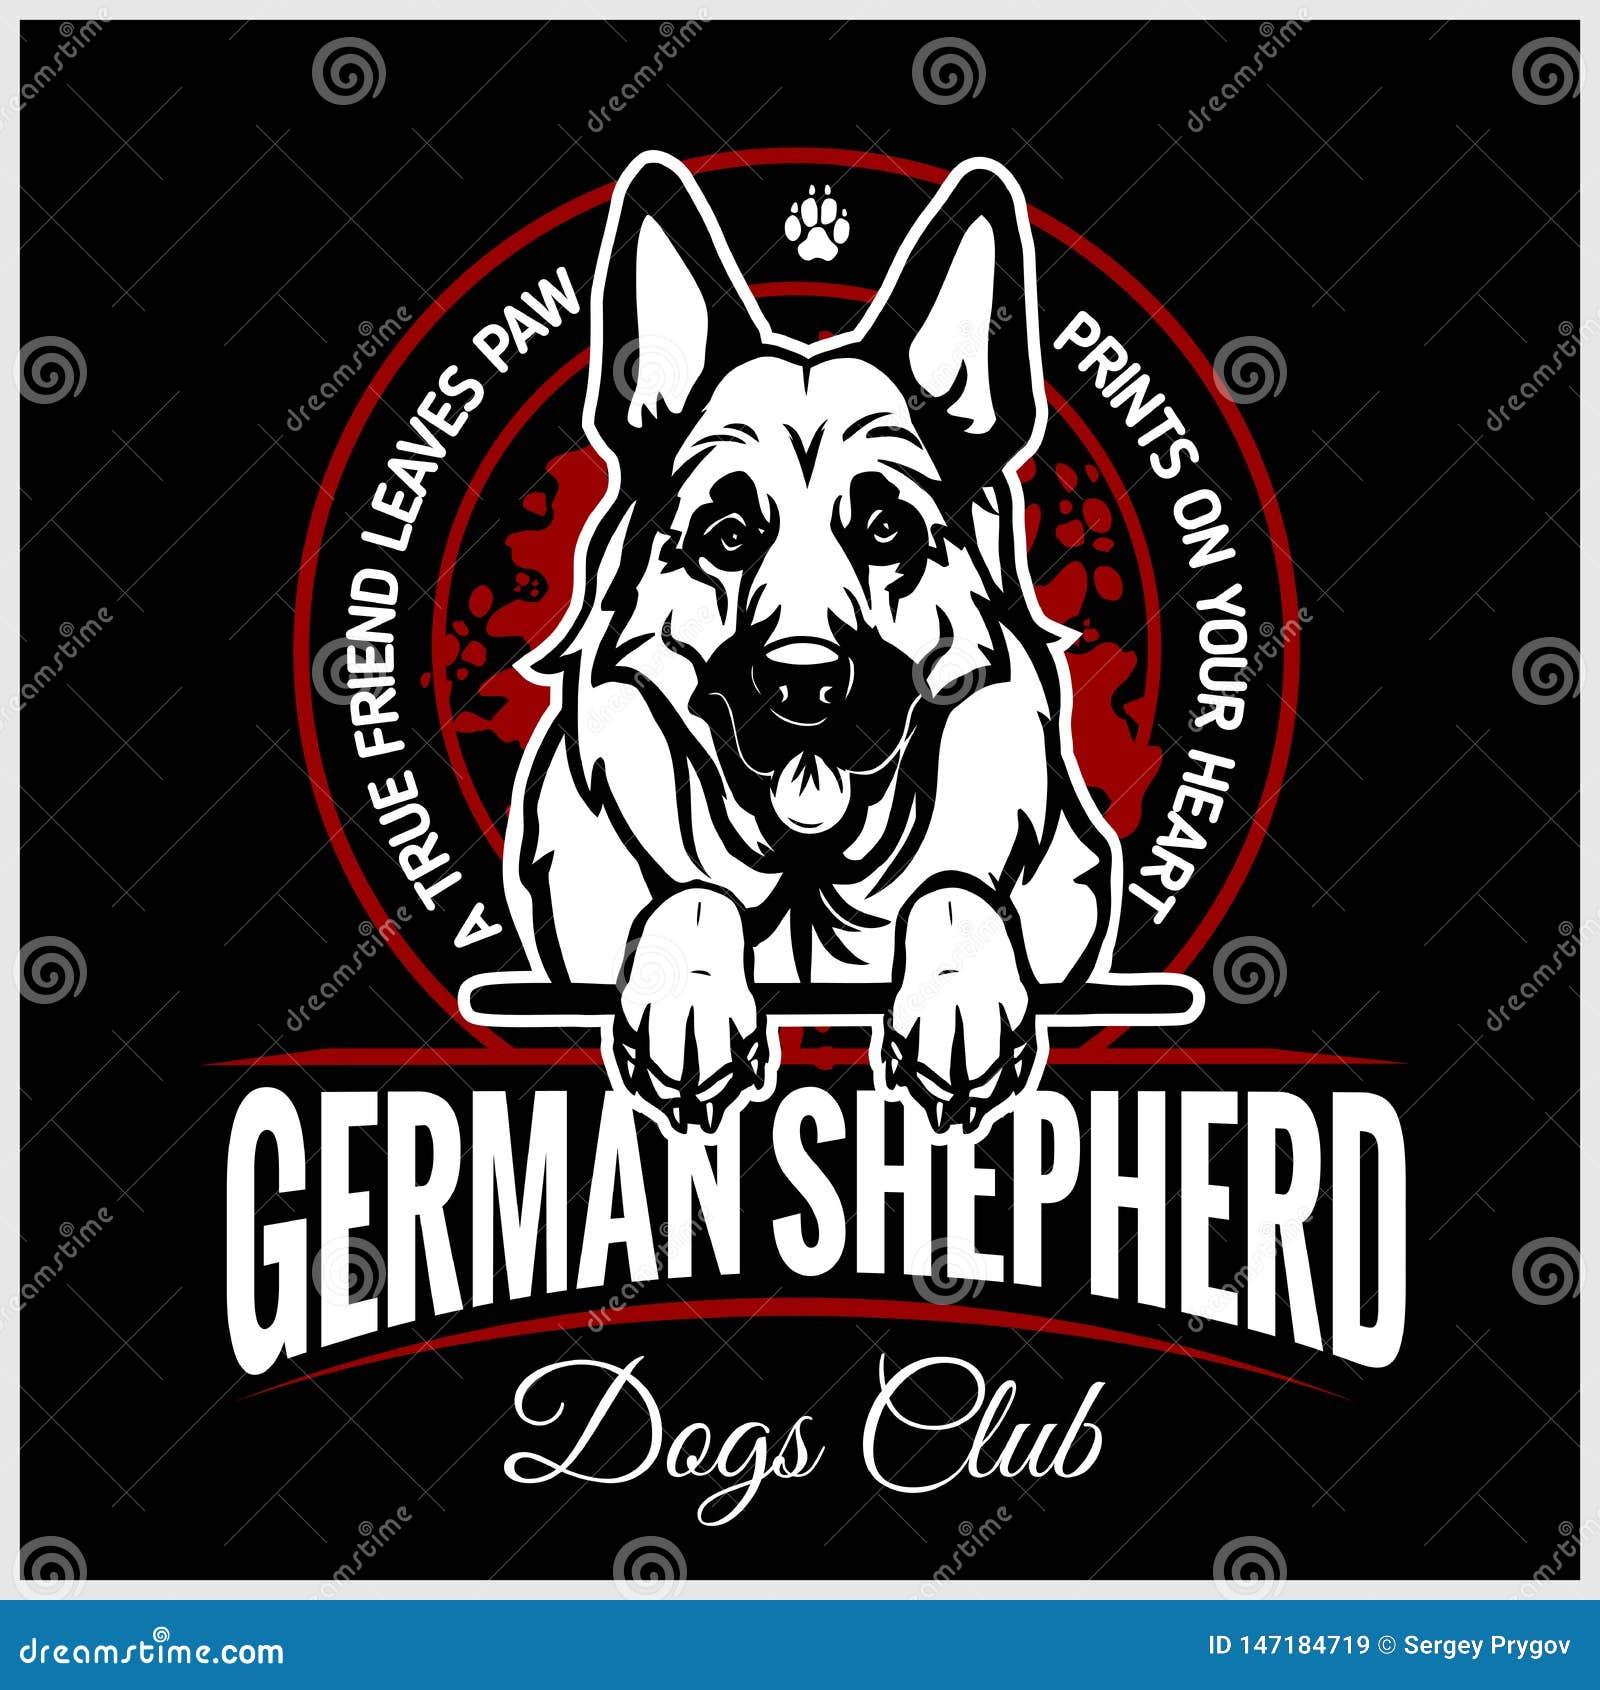 German Shepherd - vector illustration for t-shirt, logo and template badges